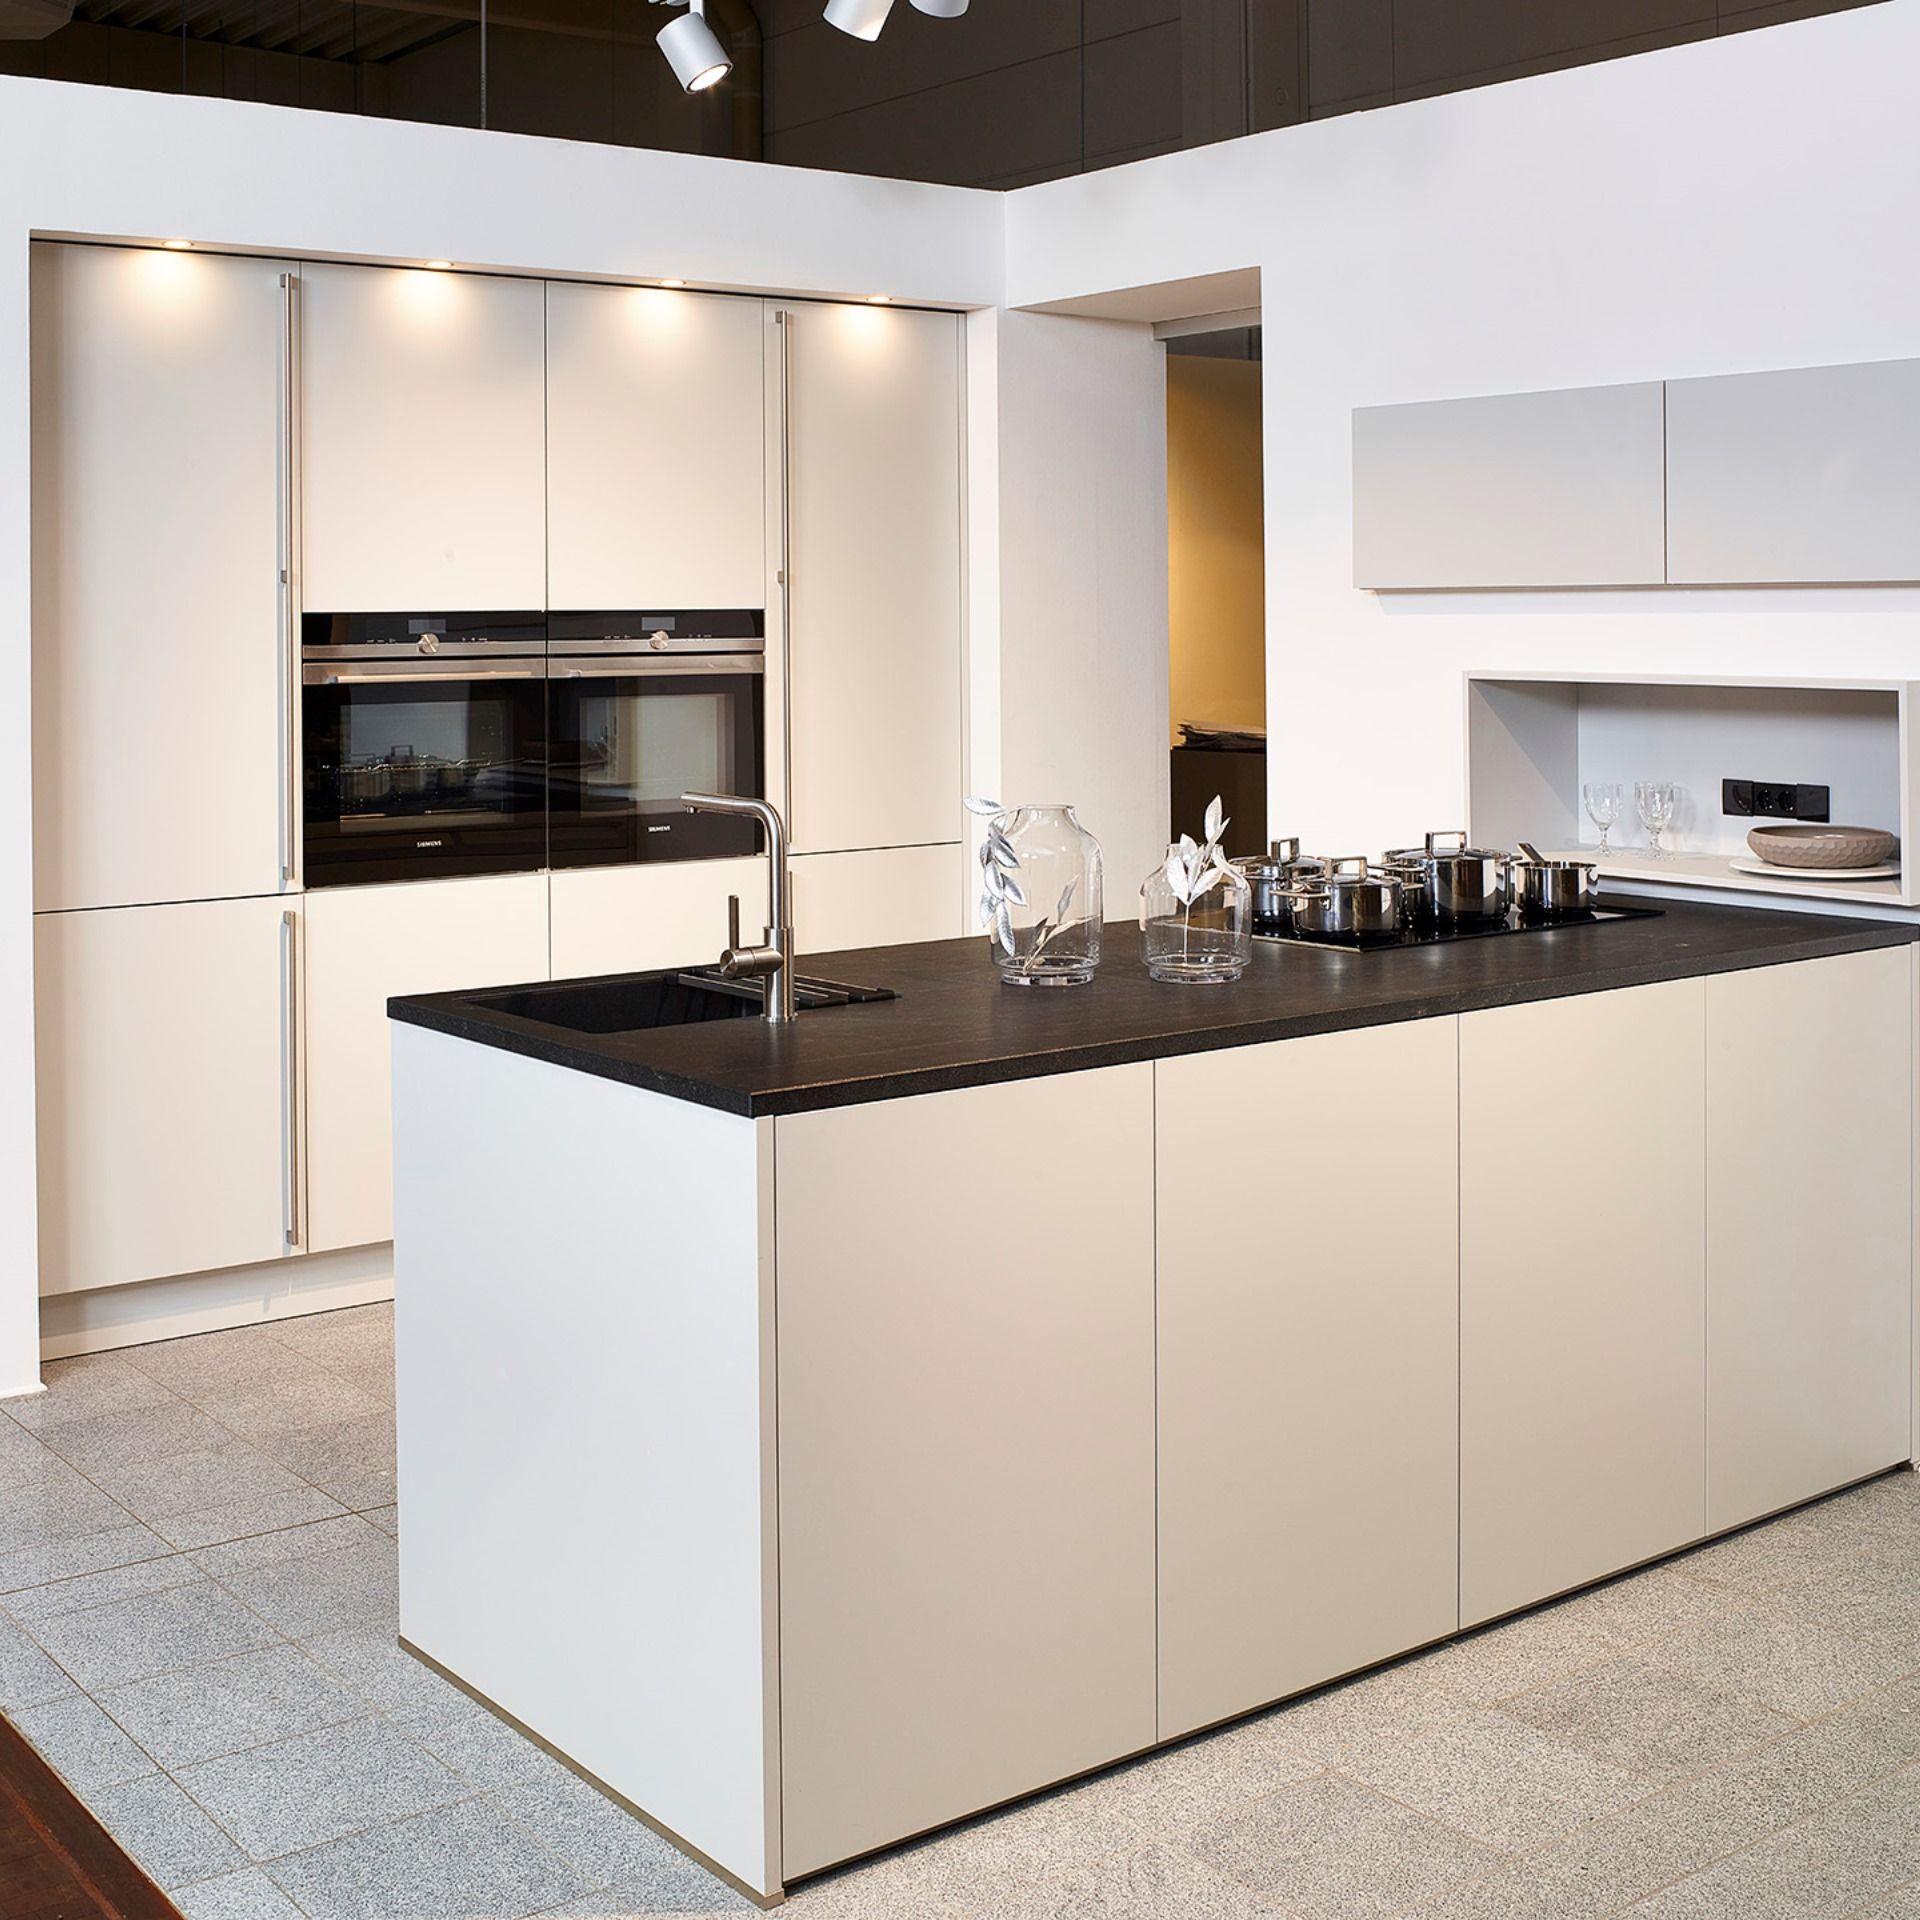 Contur Inselküche matt  Küche loft, Inselküche, Einbauschrank küche